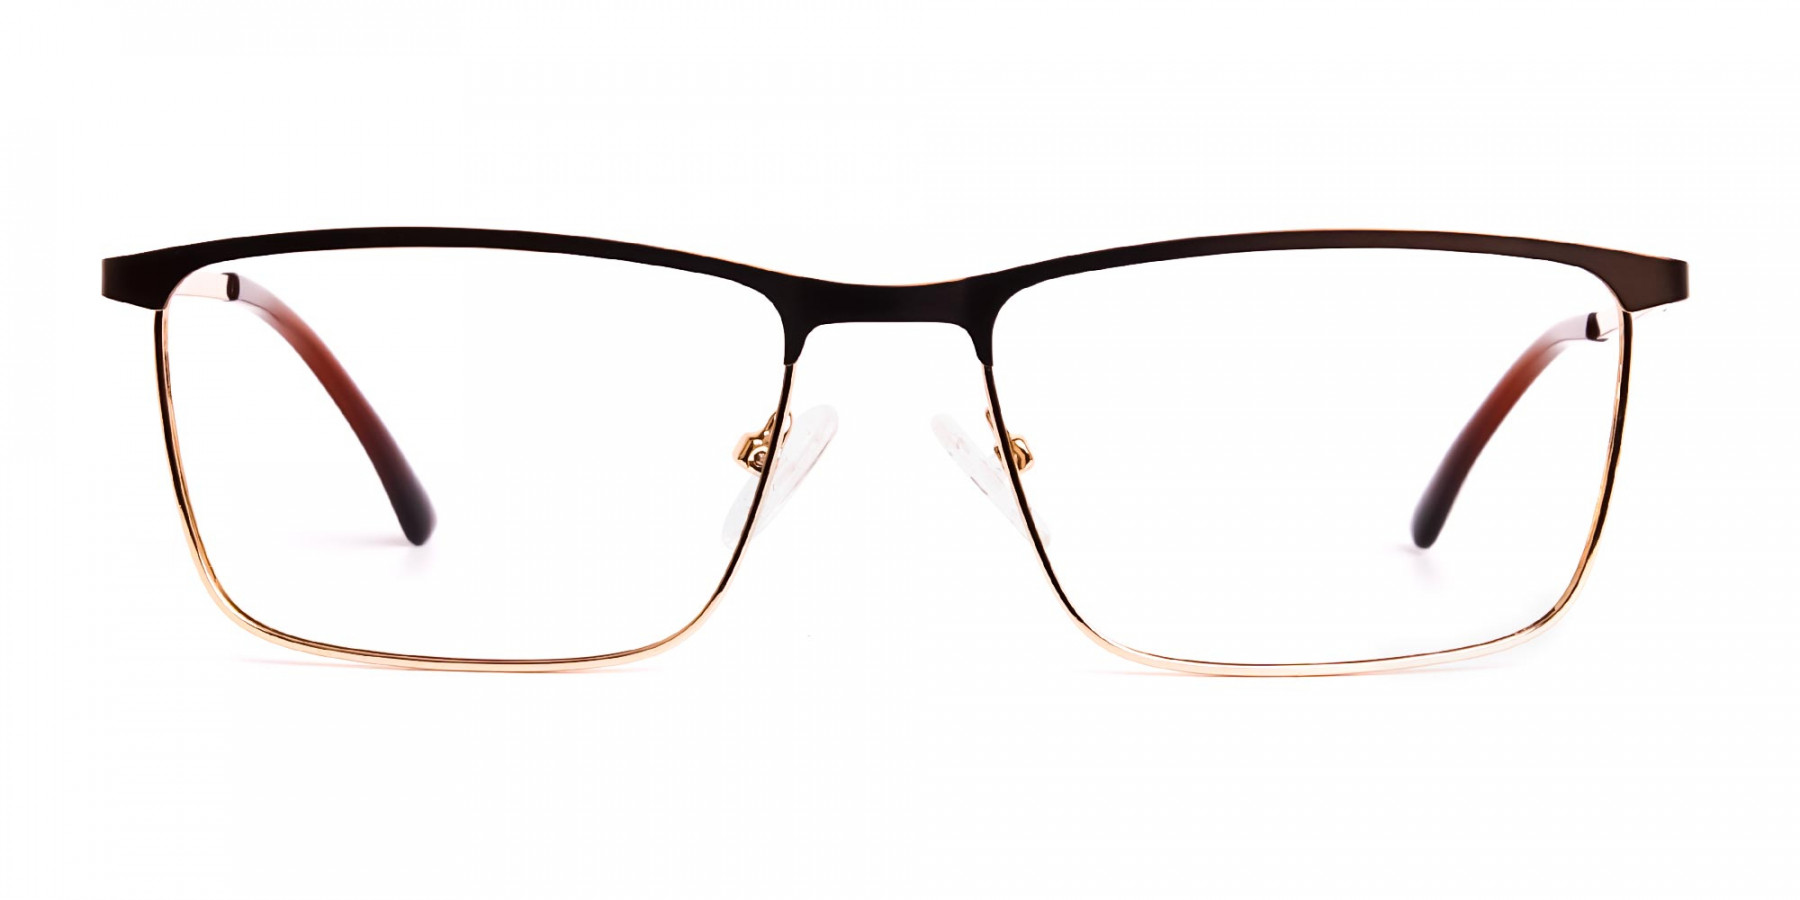 Brown & Gold Rectangular Full-Rim Glasses-1